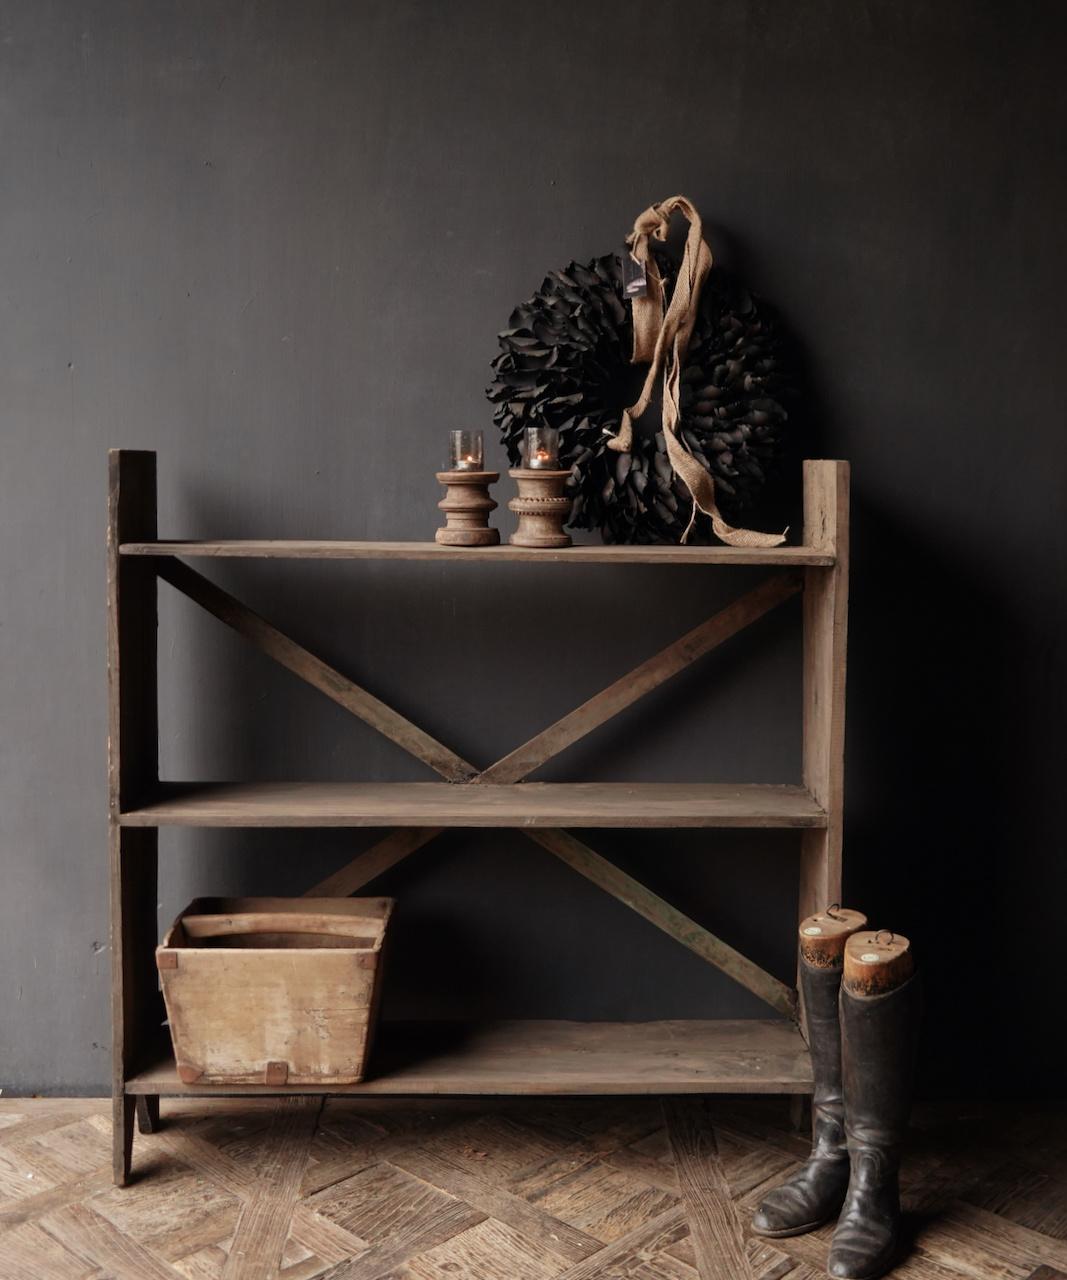 Gestell aus altem gebrauchtem Holz-1